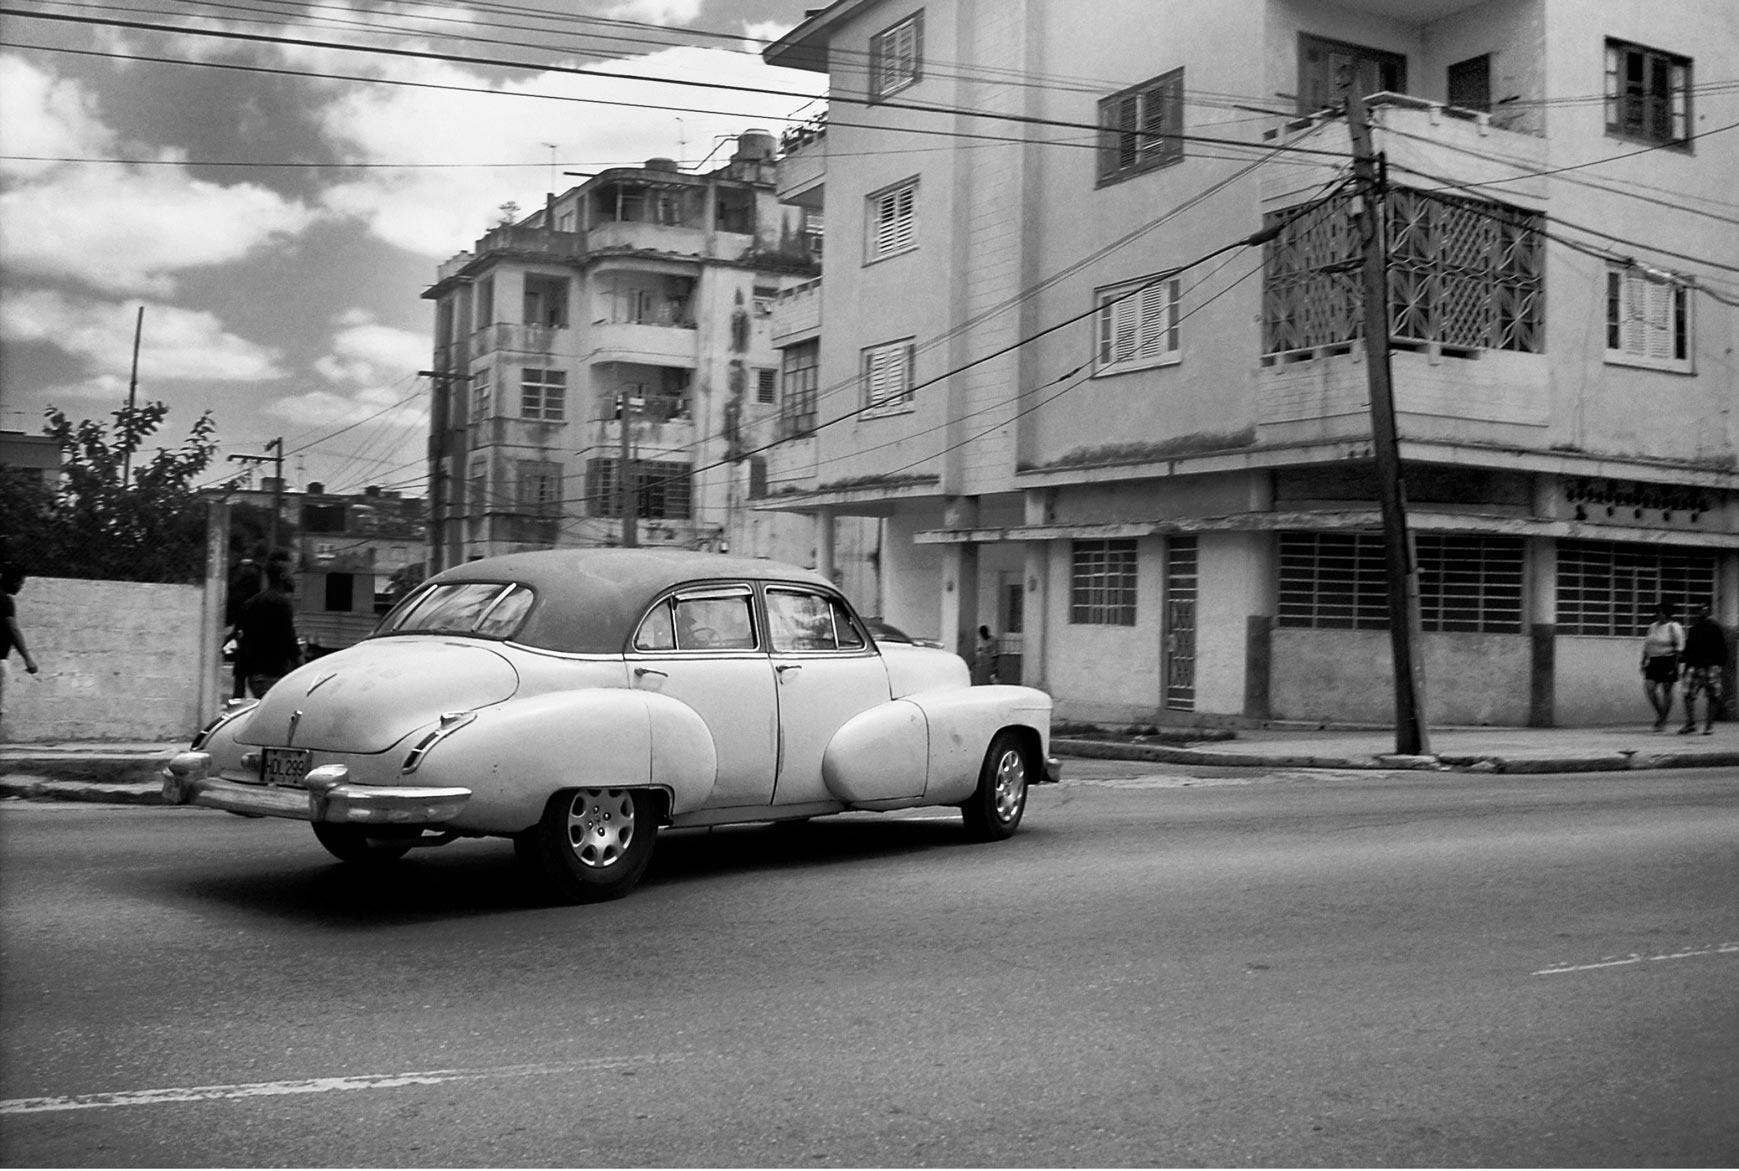 LE-MILE-Magazine-Blue-Magic-Cuba-by-Alban-E.-Smajli---1.jpg